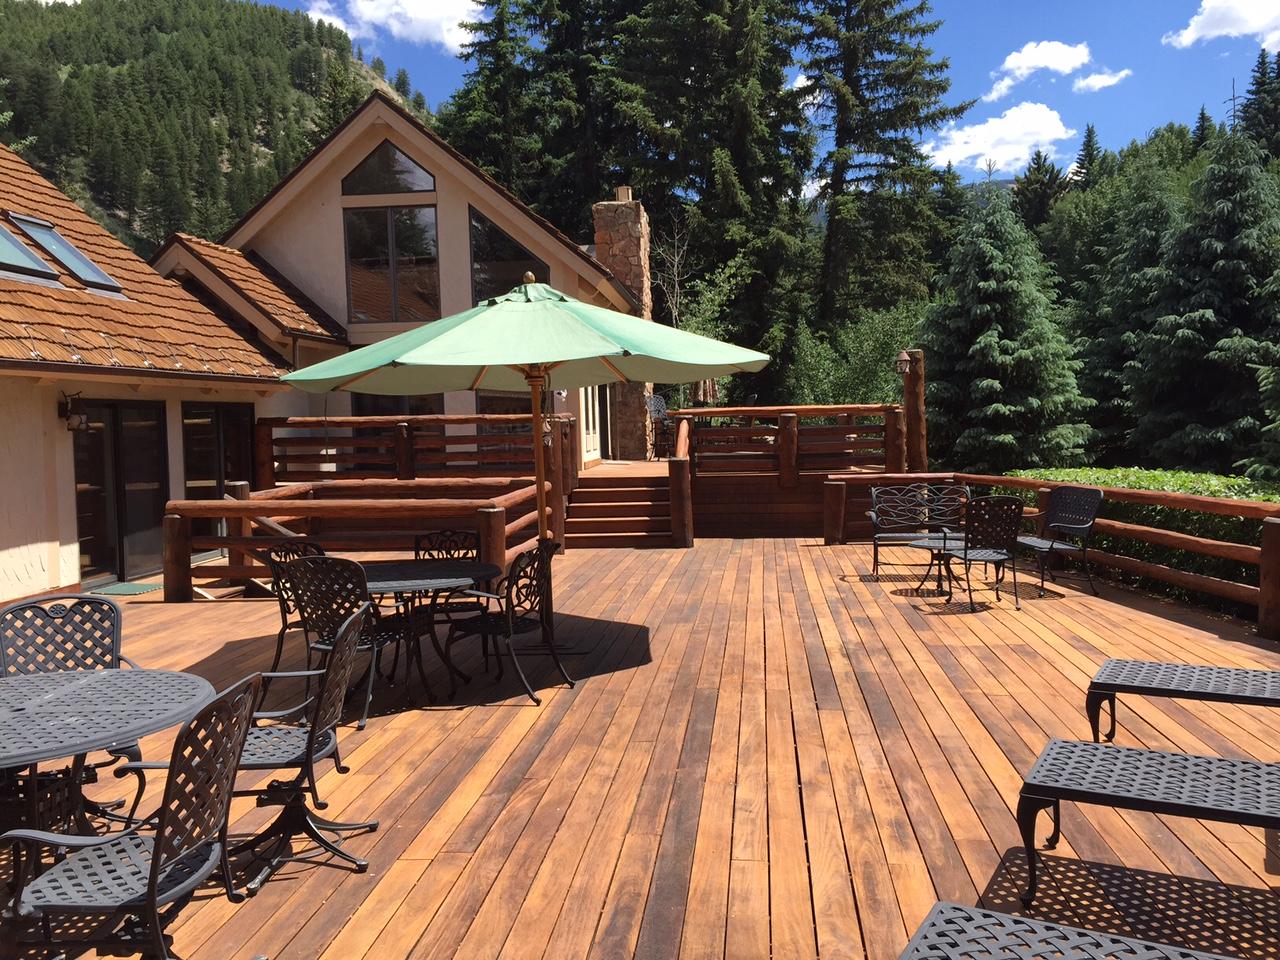 Beaver Creek At Vail Colorado Luxury Home Rental - Colorado luxury homes